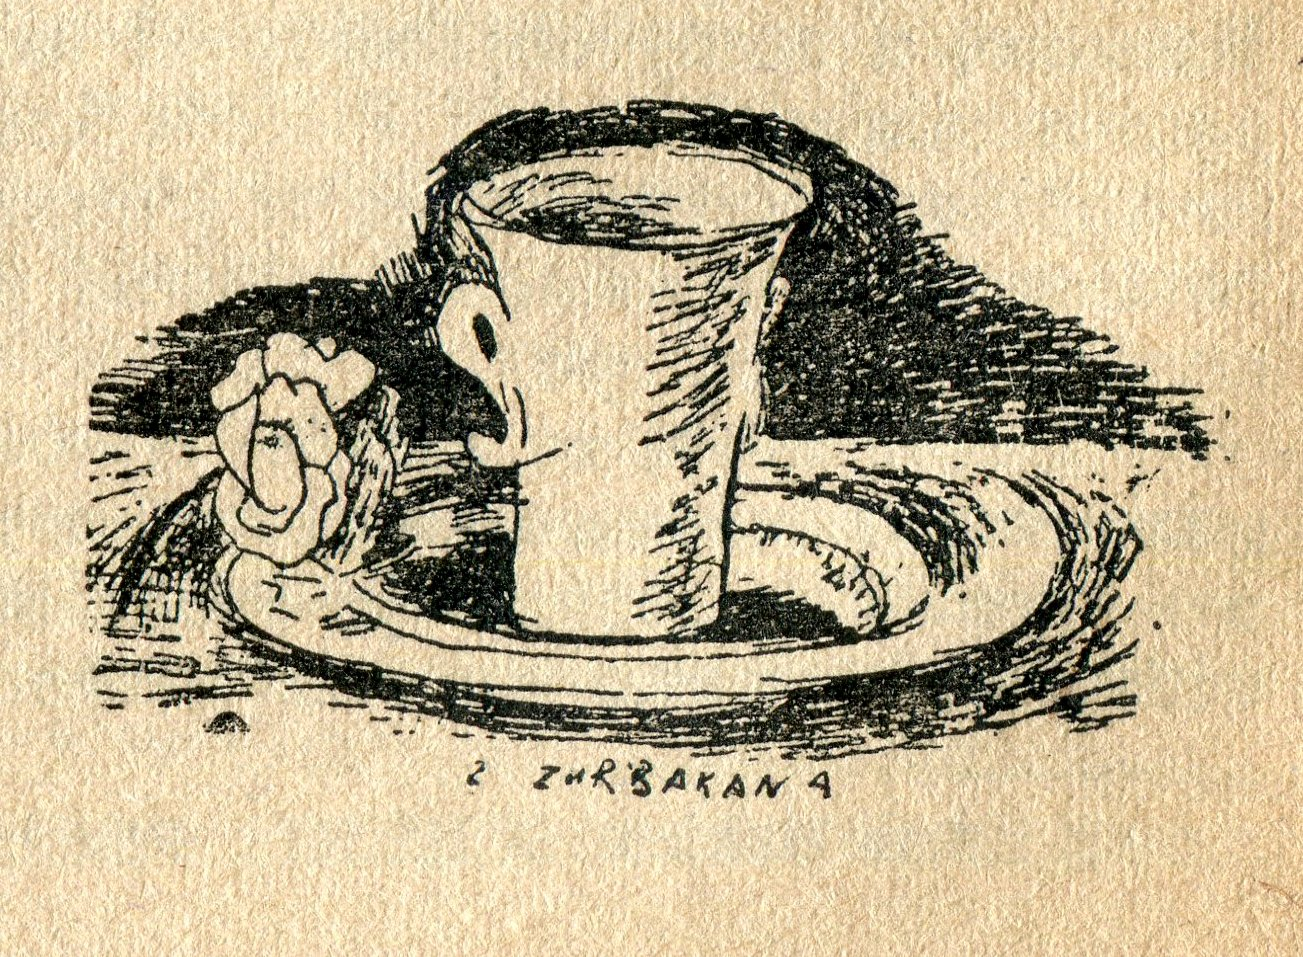 "<div class='inner-box'><div class='close-desc'></div><span class='opis'>Józef Czapski - rysunek ""Z Zurbarana"", ilustrujący tekst J.Cz. pt. ""Rzeczy żywe i bez ruchu"". ""Kultura"" nr 10/72, 1953 r. s. 10.</span><div class='clearfix'></div><span>Cote du document sm00252</span><div class='clearfix'></div><span>© Instytut Literacki</span></div>"